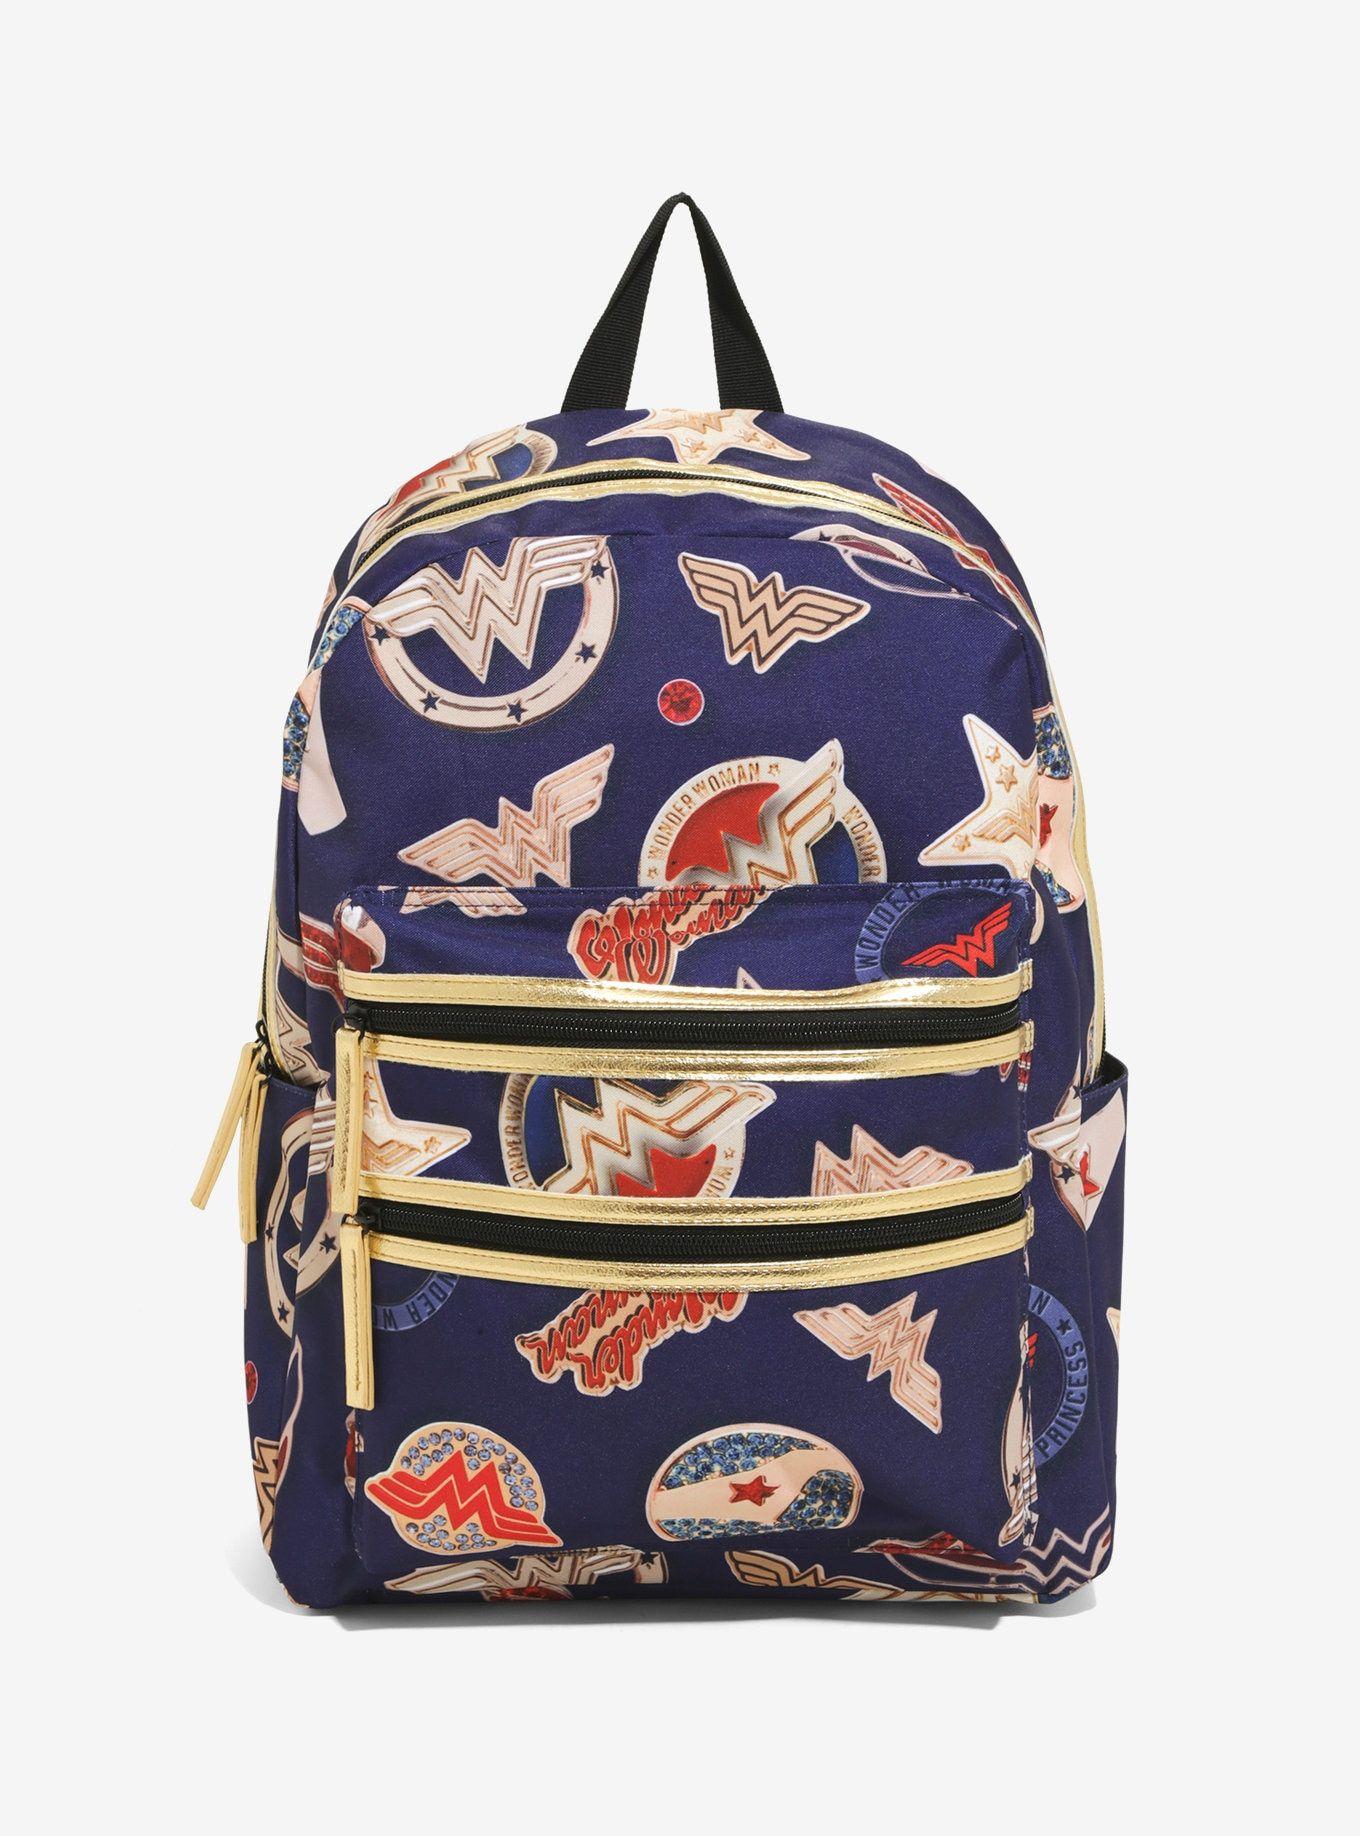 DC Comics Wonder Woman Double Zipper Pocket Backpack Book Bag